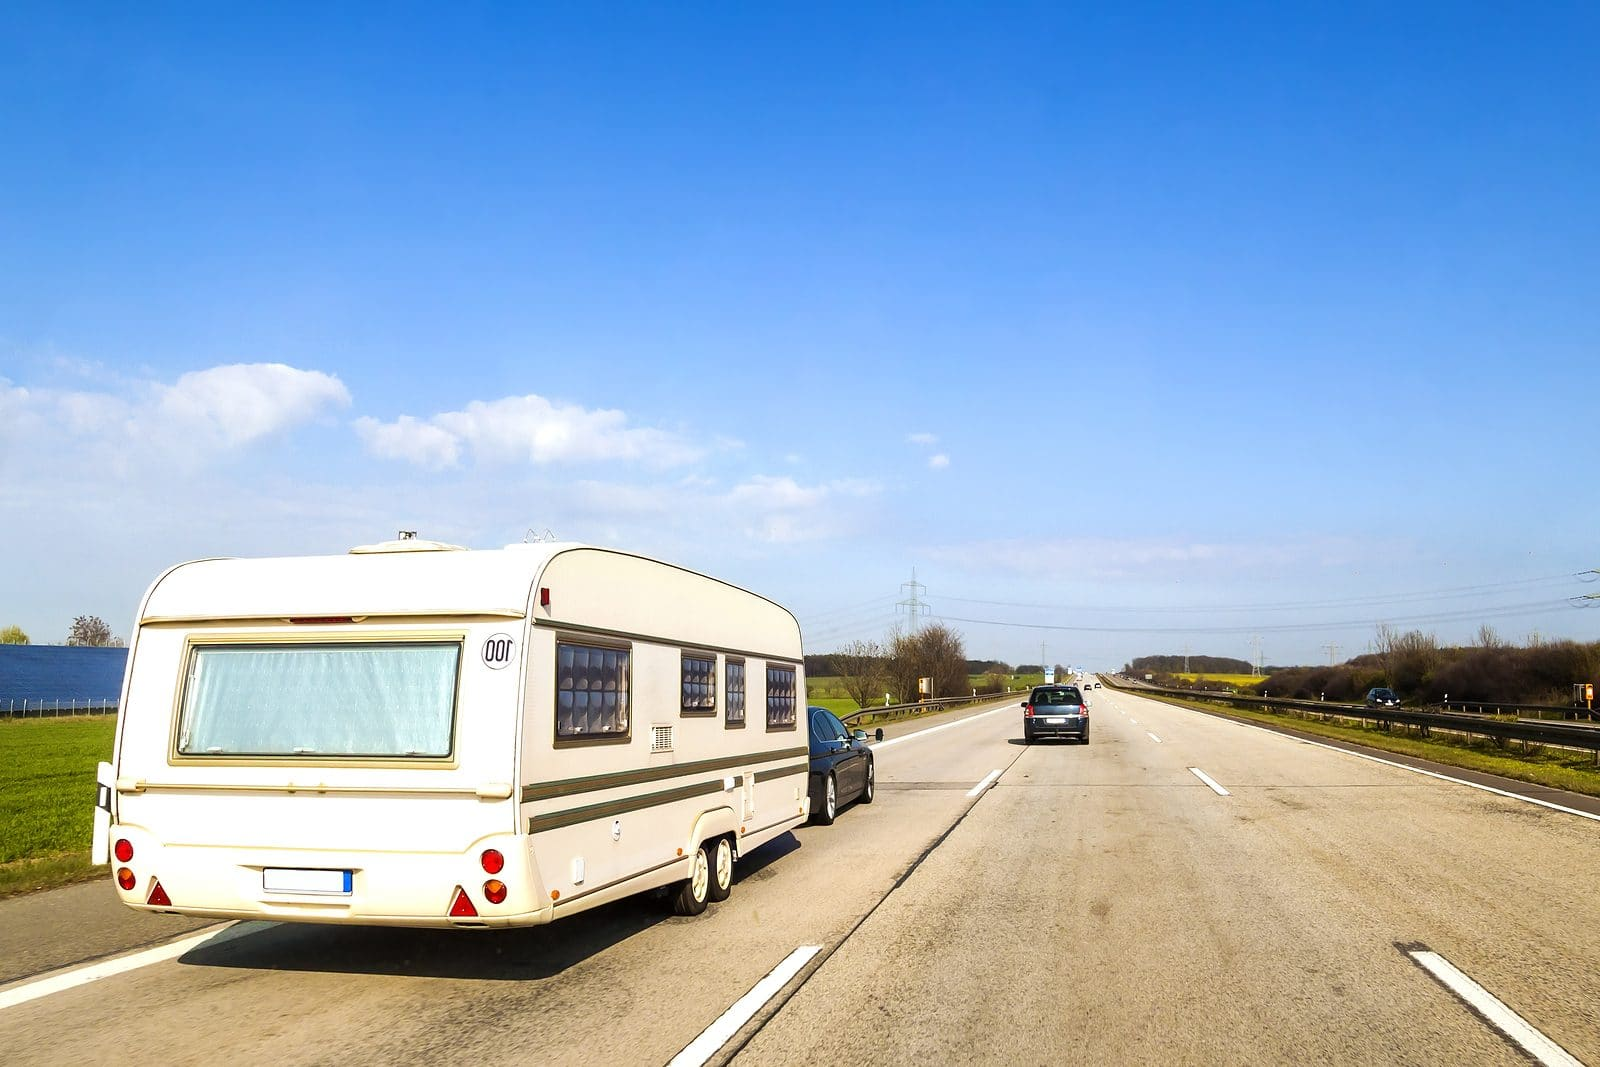 Caravan Or Recreational Vehicle Motor Home Trailer On A Freeway